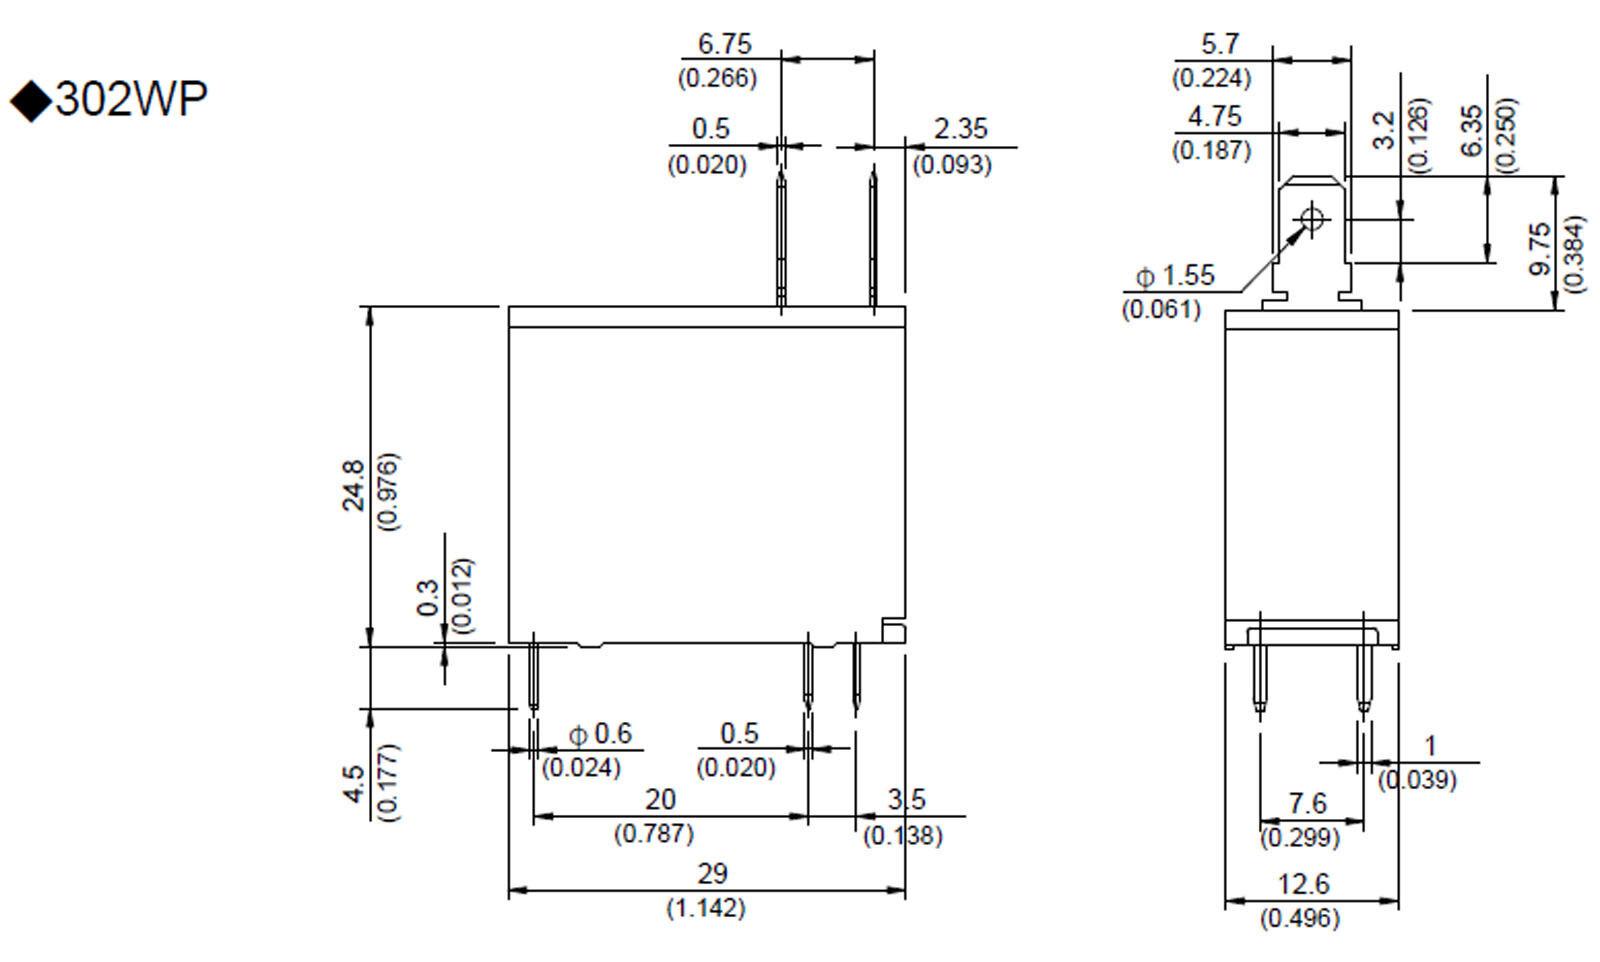 1pcs Miniature PCB Power Relay Song Chuan 302 302wp-1ah-c M02 12vdc | eBay